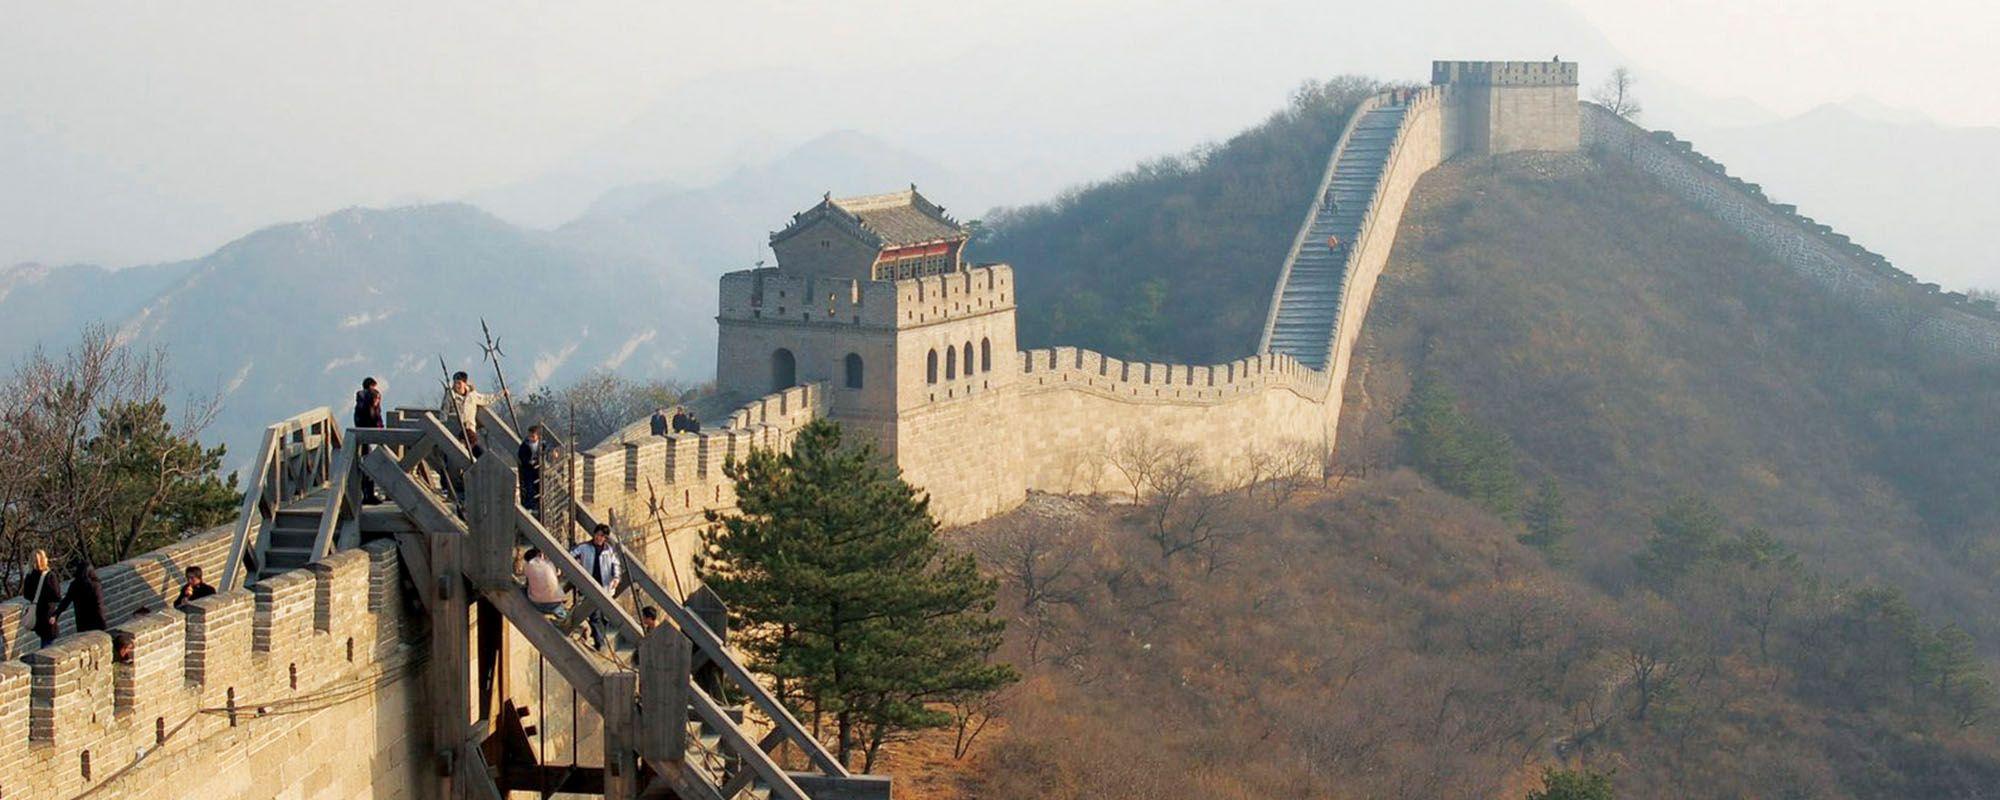 College in Cina